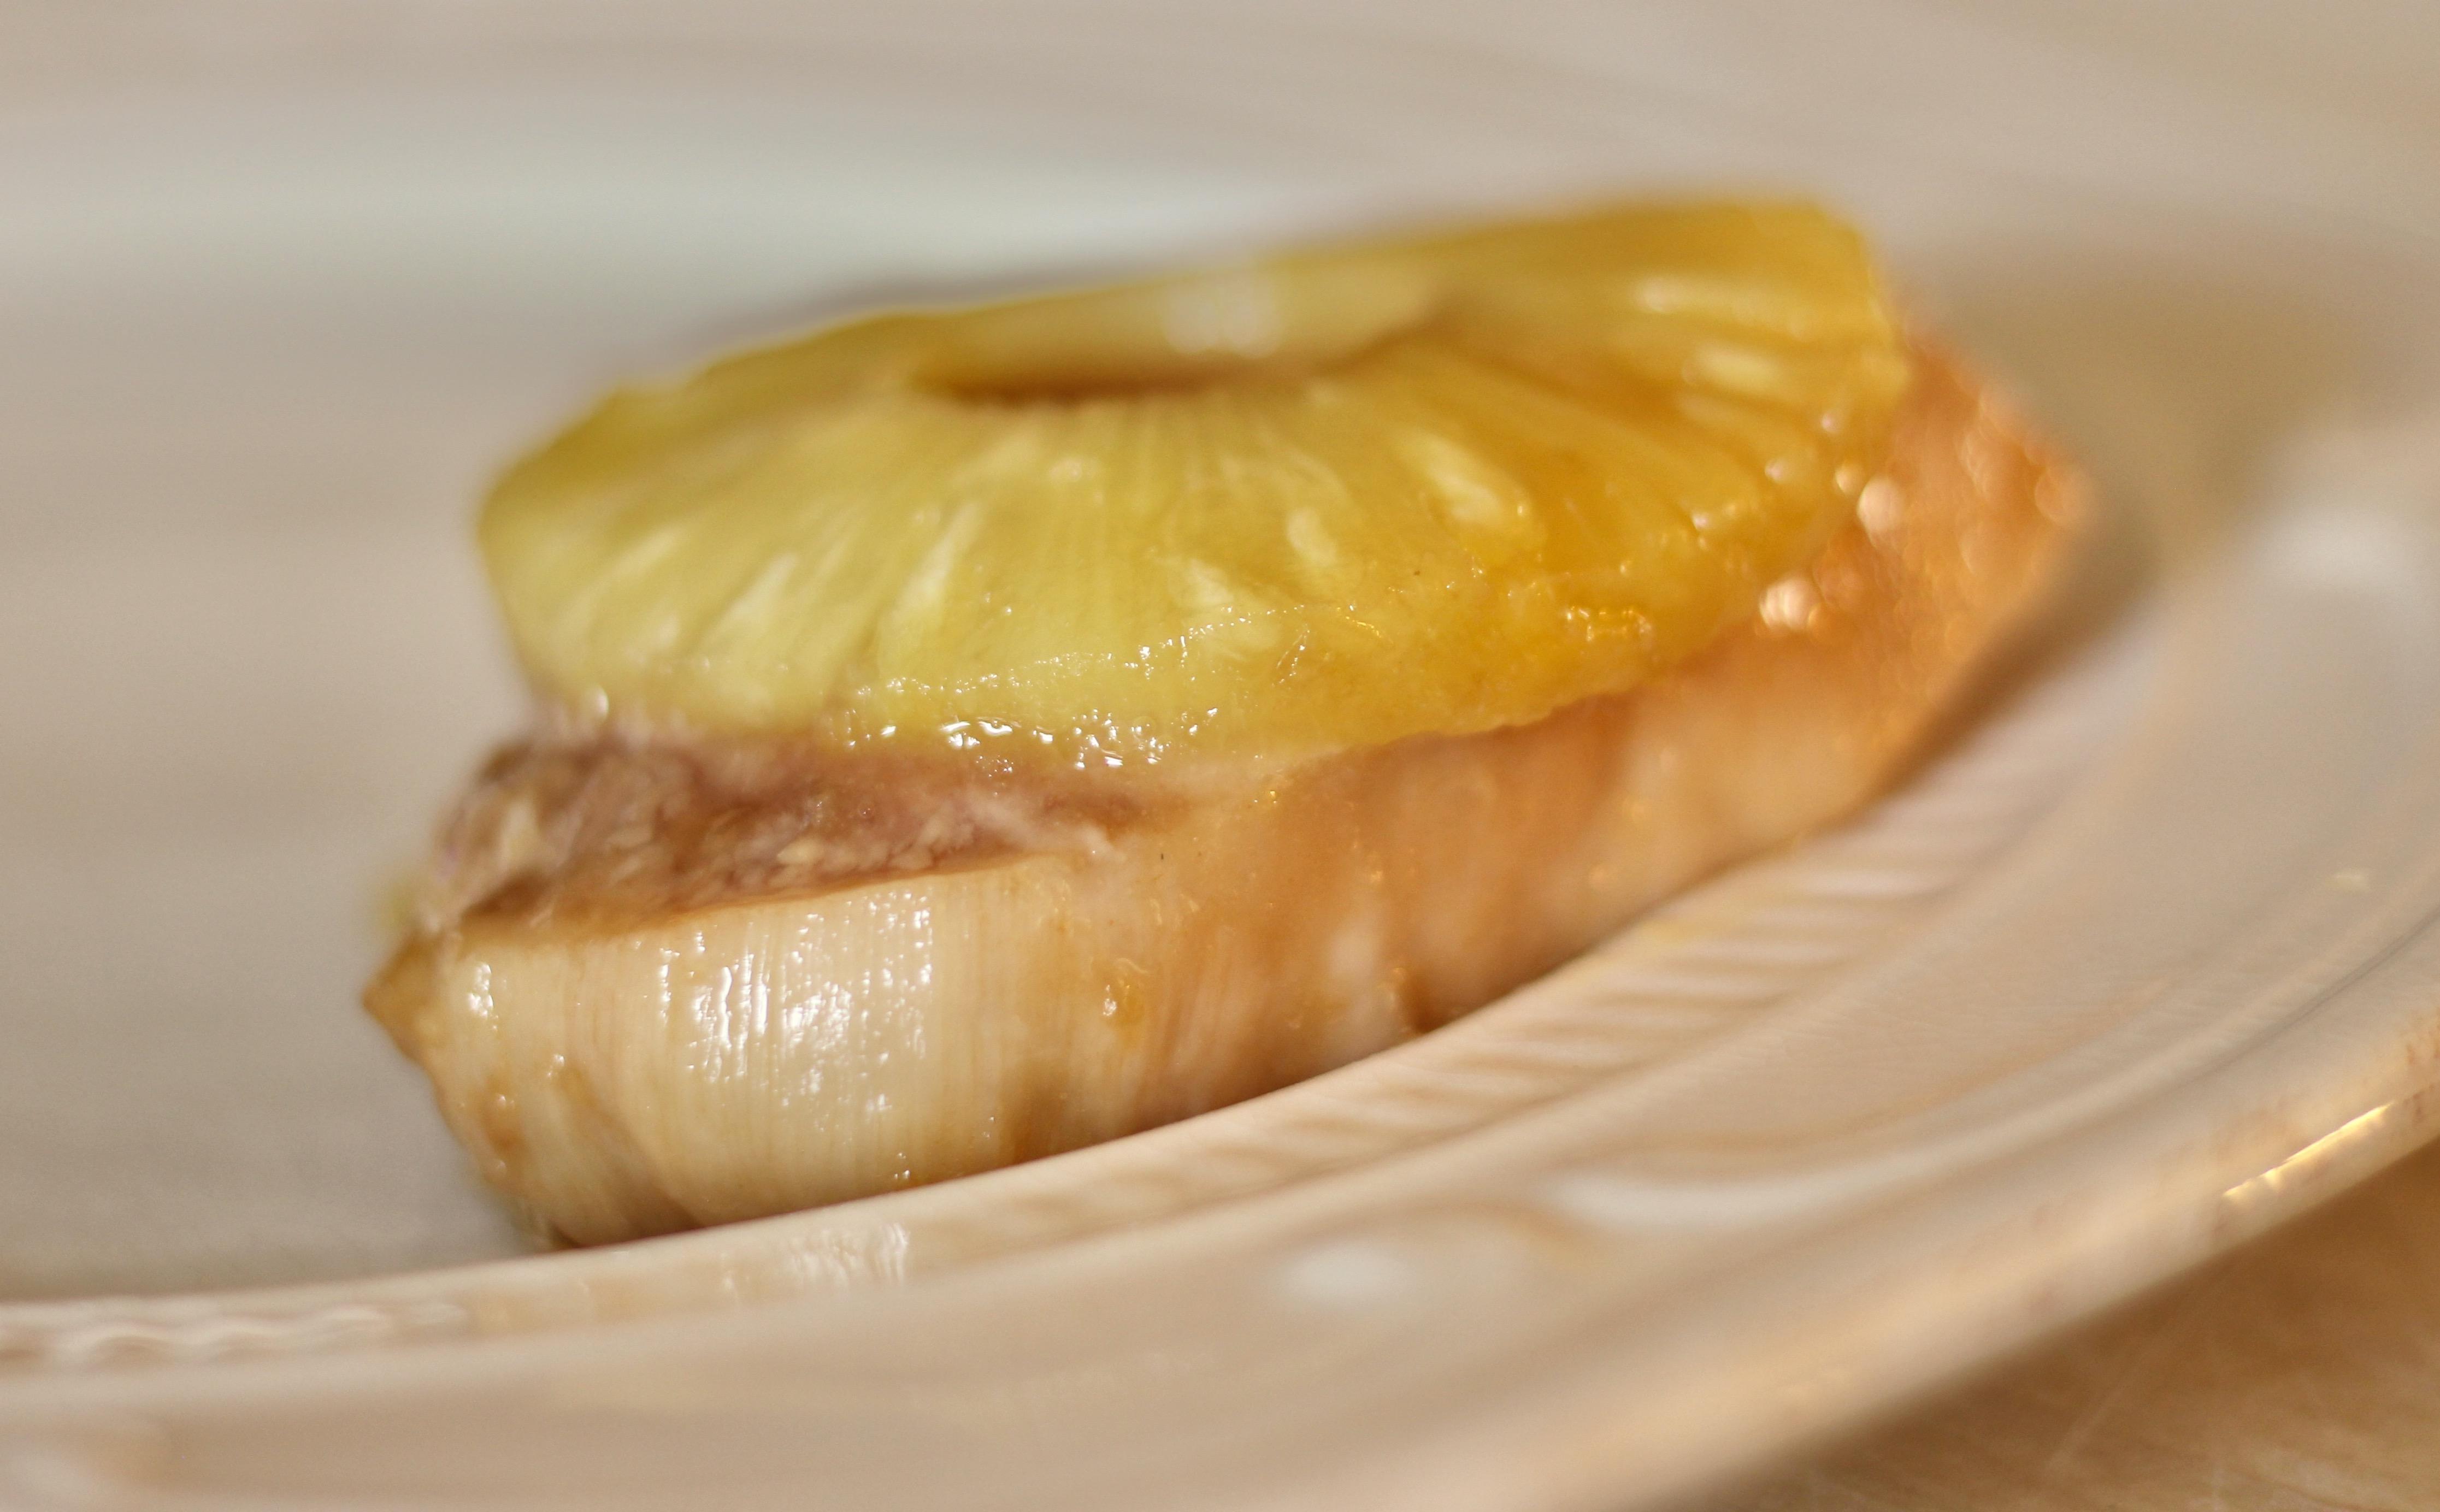 Pineapple-Teriyaki Pork Chops